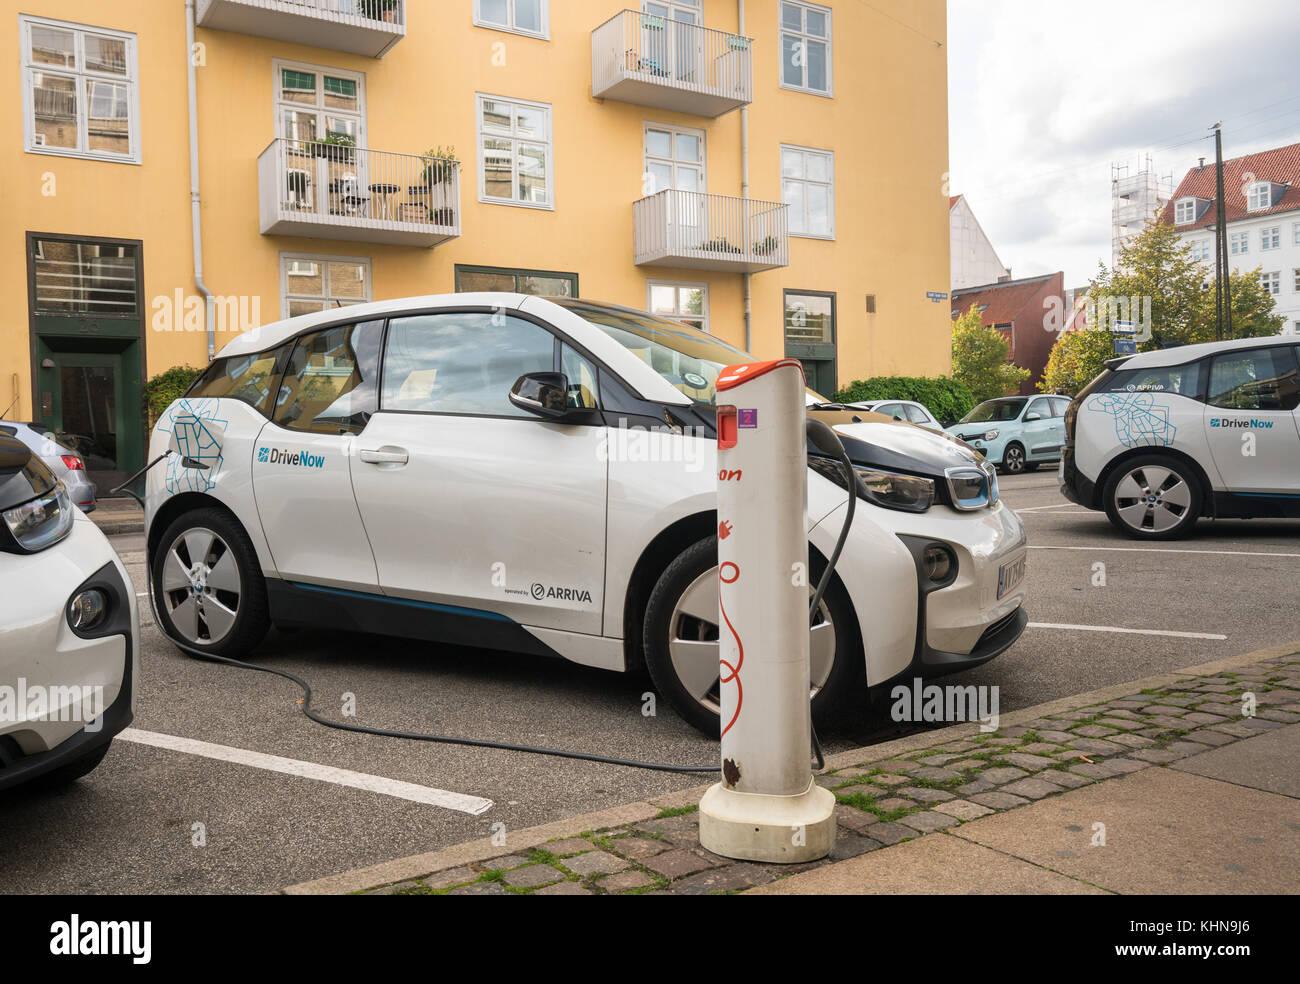 DriveNow BMW electric car in Copenhagen - Stock Image